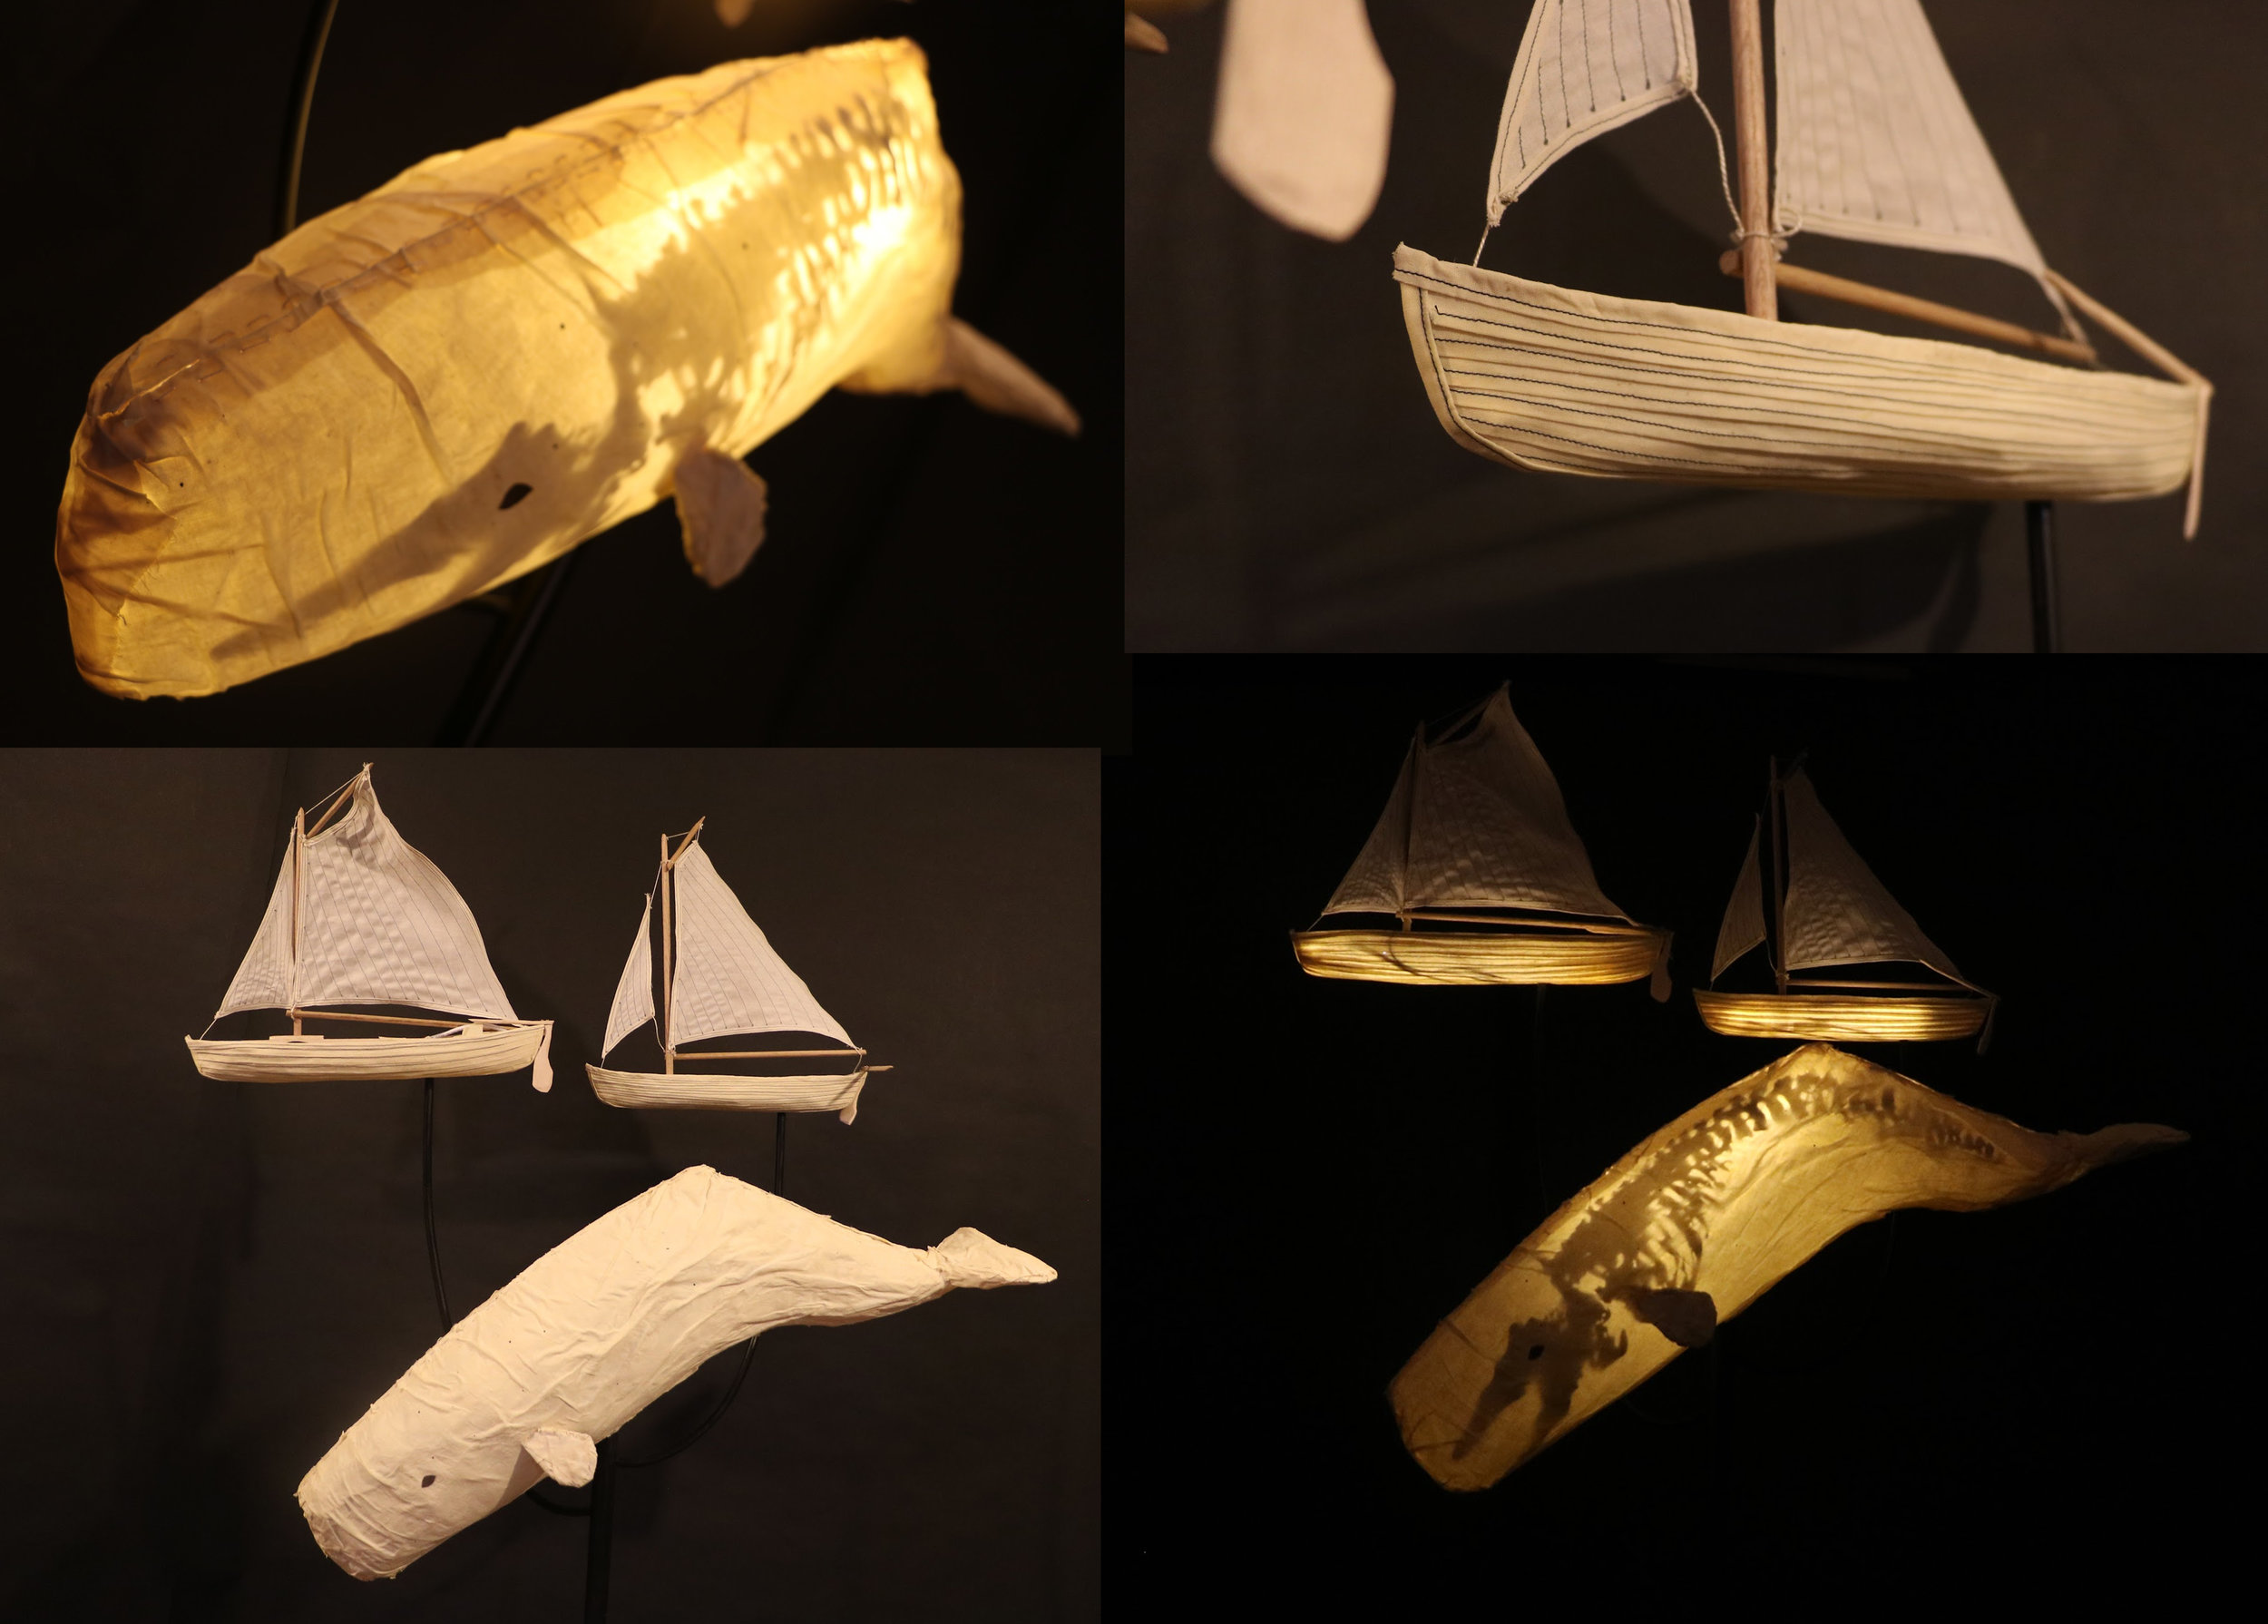 Sperm Whale Skeleton Lantern w/boats